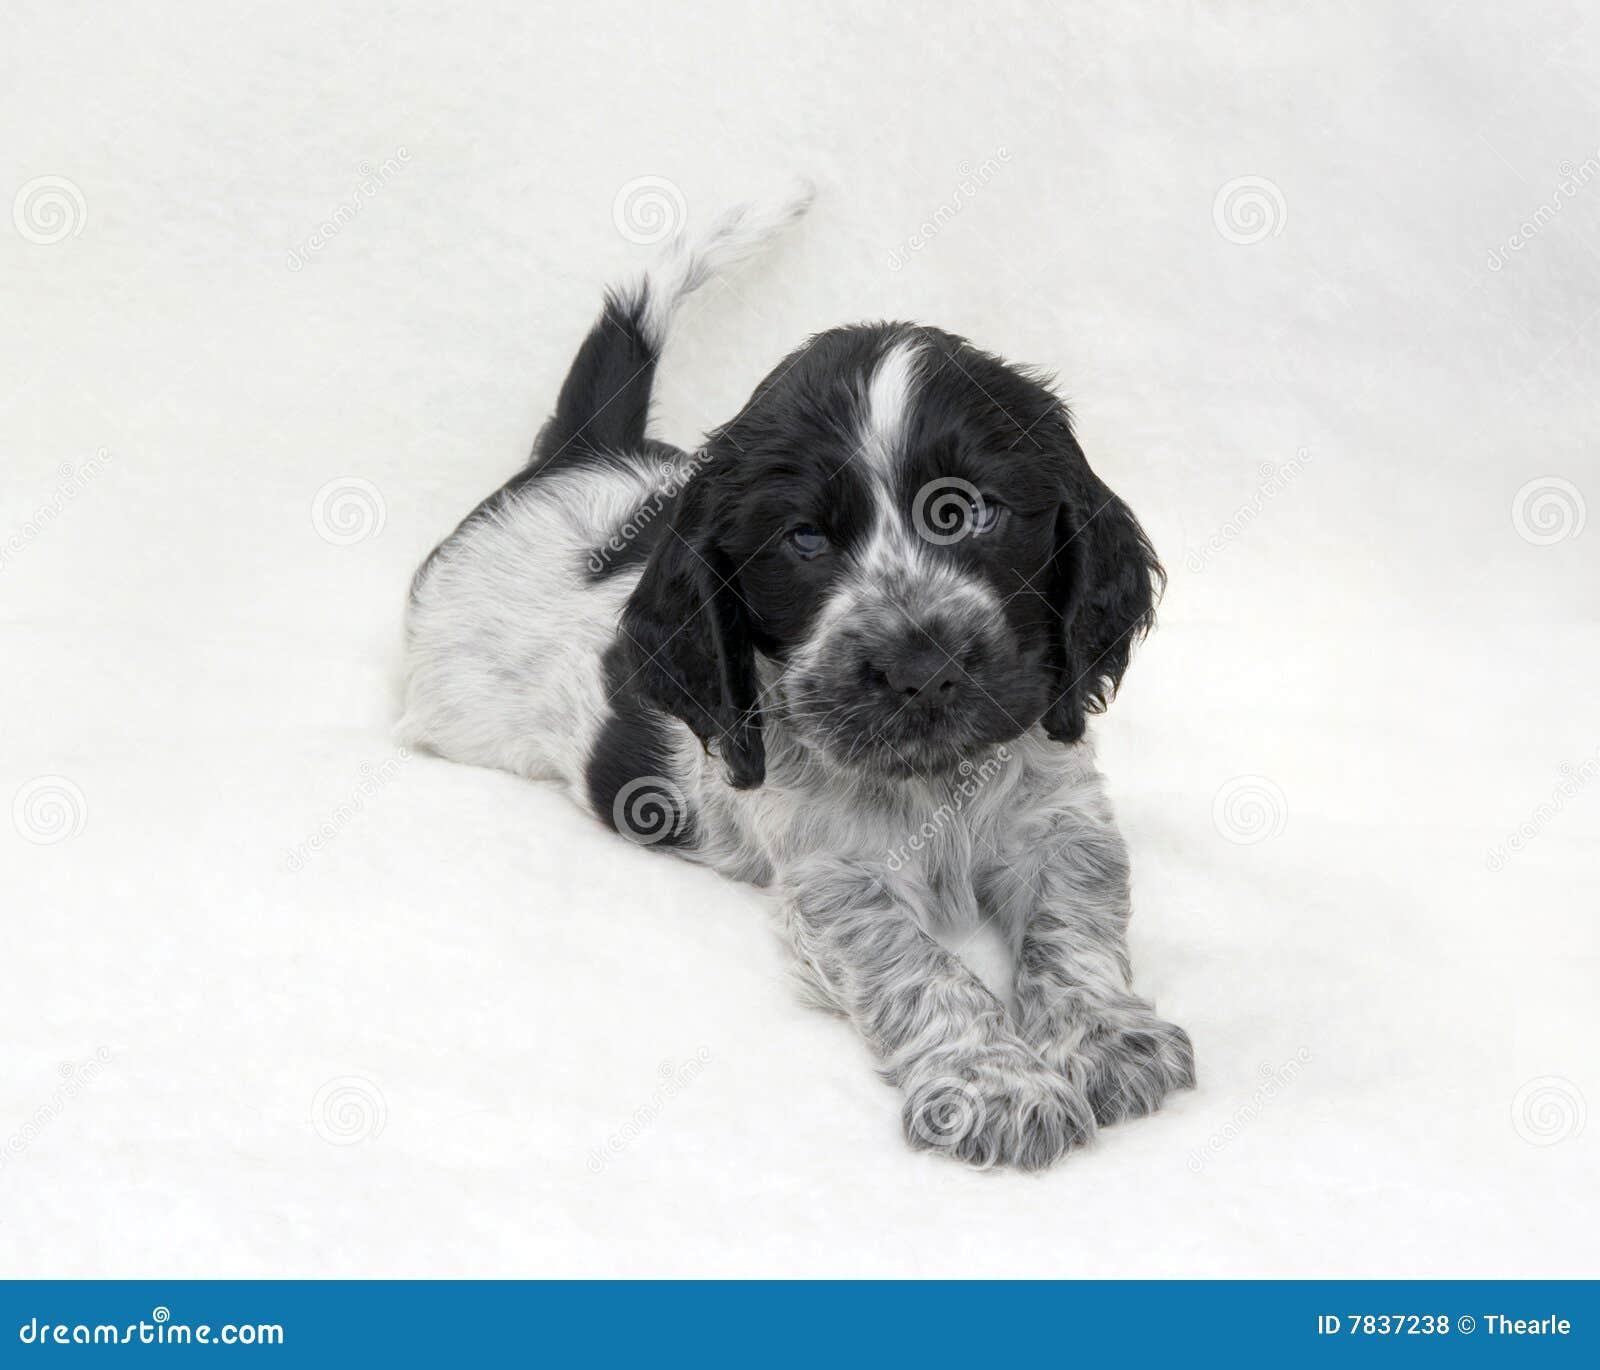 Puppy Cocker Spaniel Blue Roan Royalty Free Stock Photos